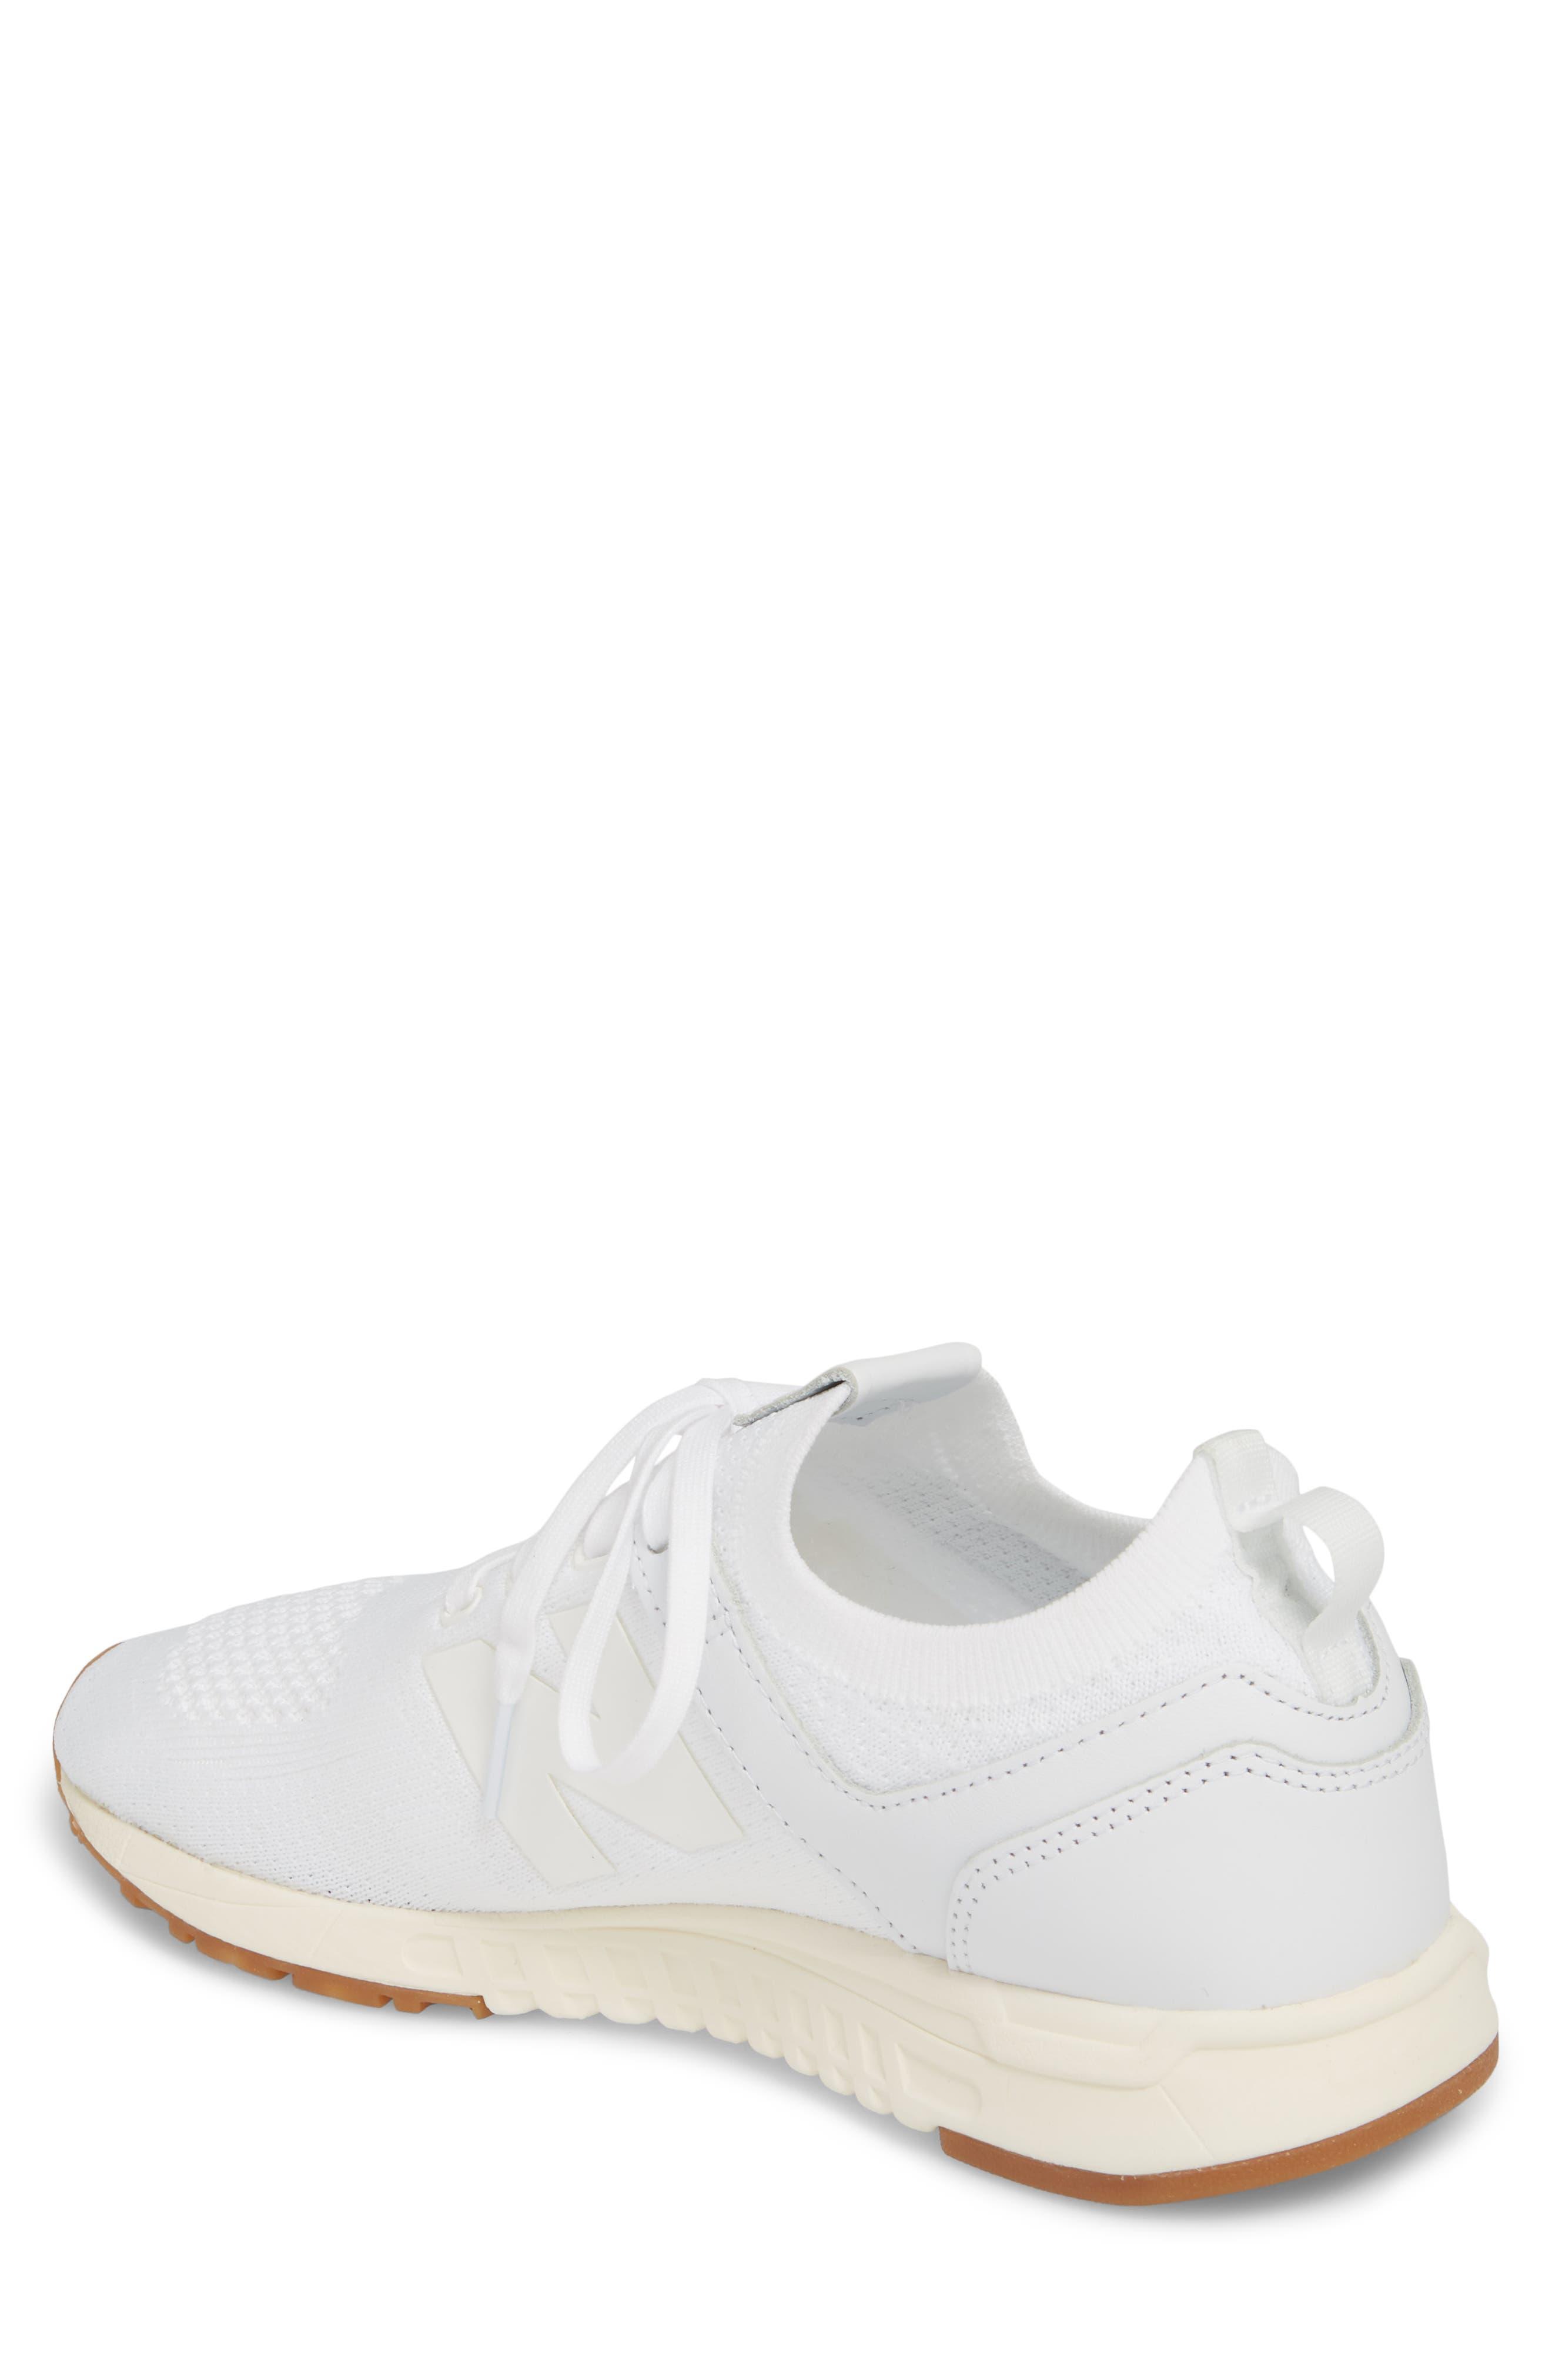 247 Decon Knit Sneaker,                             Alternate thumbnail 2, color,                             WHITE